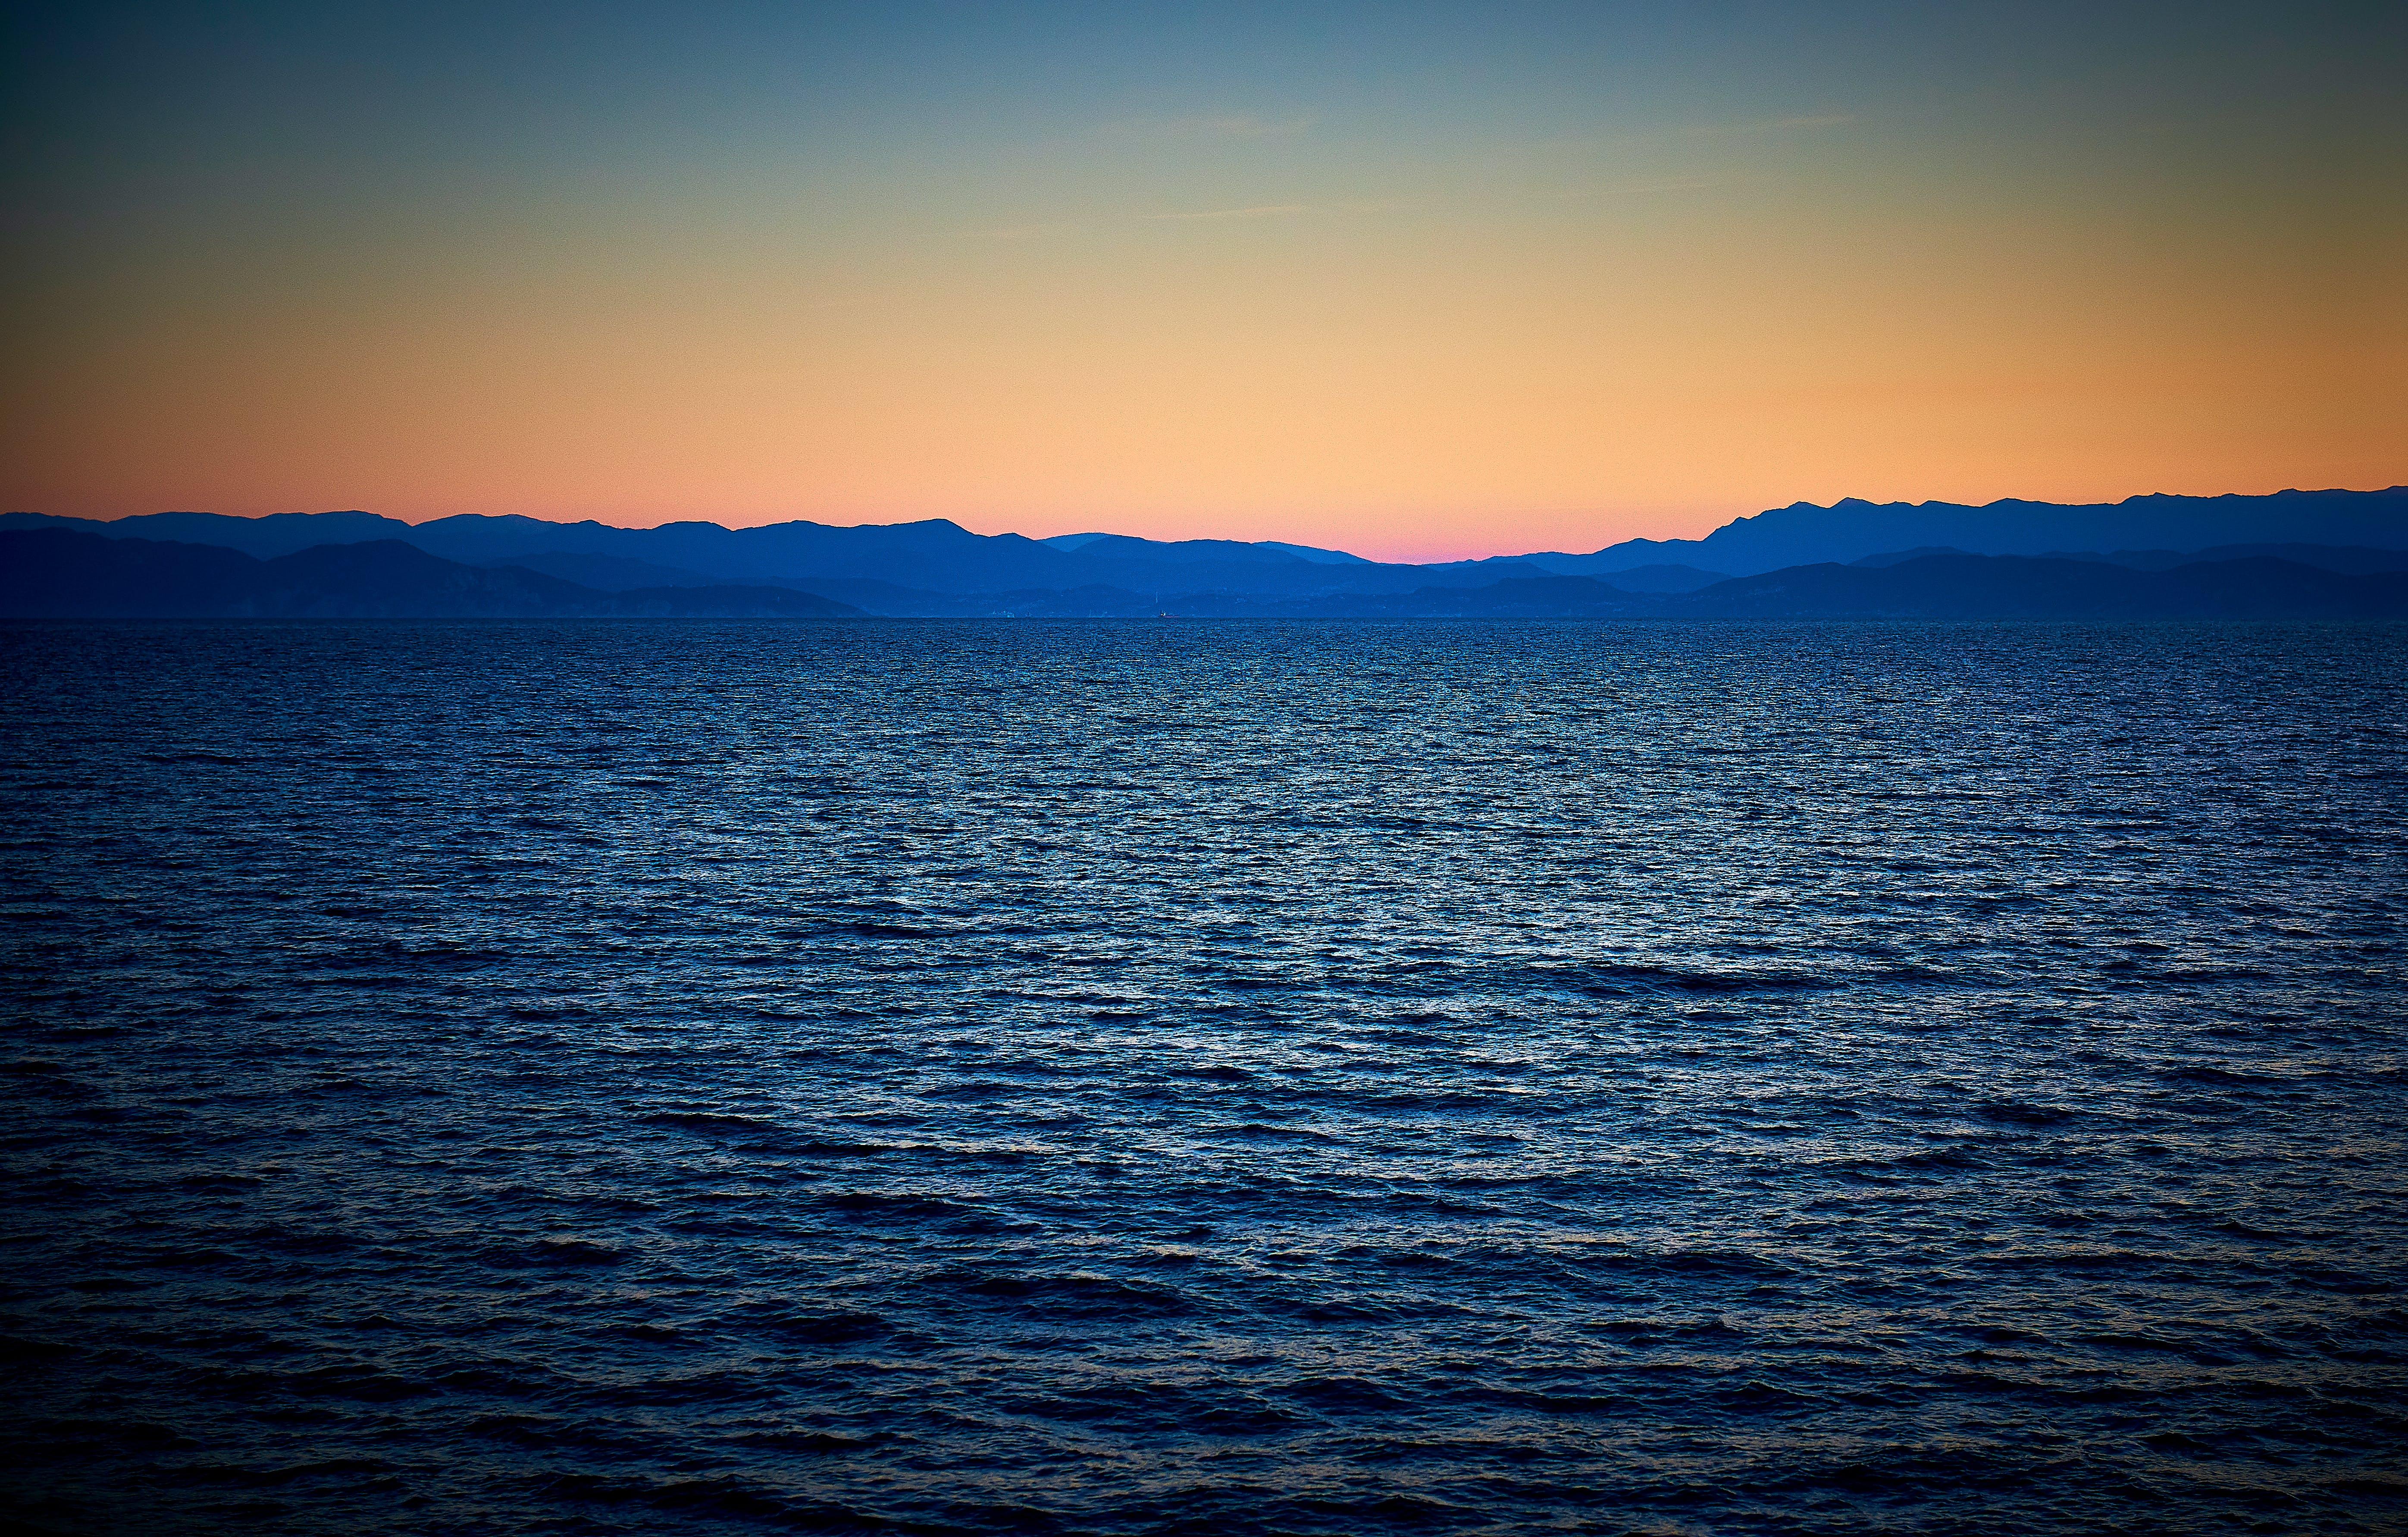 Free stock photo of mediterrean, ocean, ocean cruise, sunset